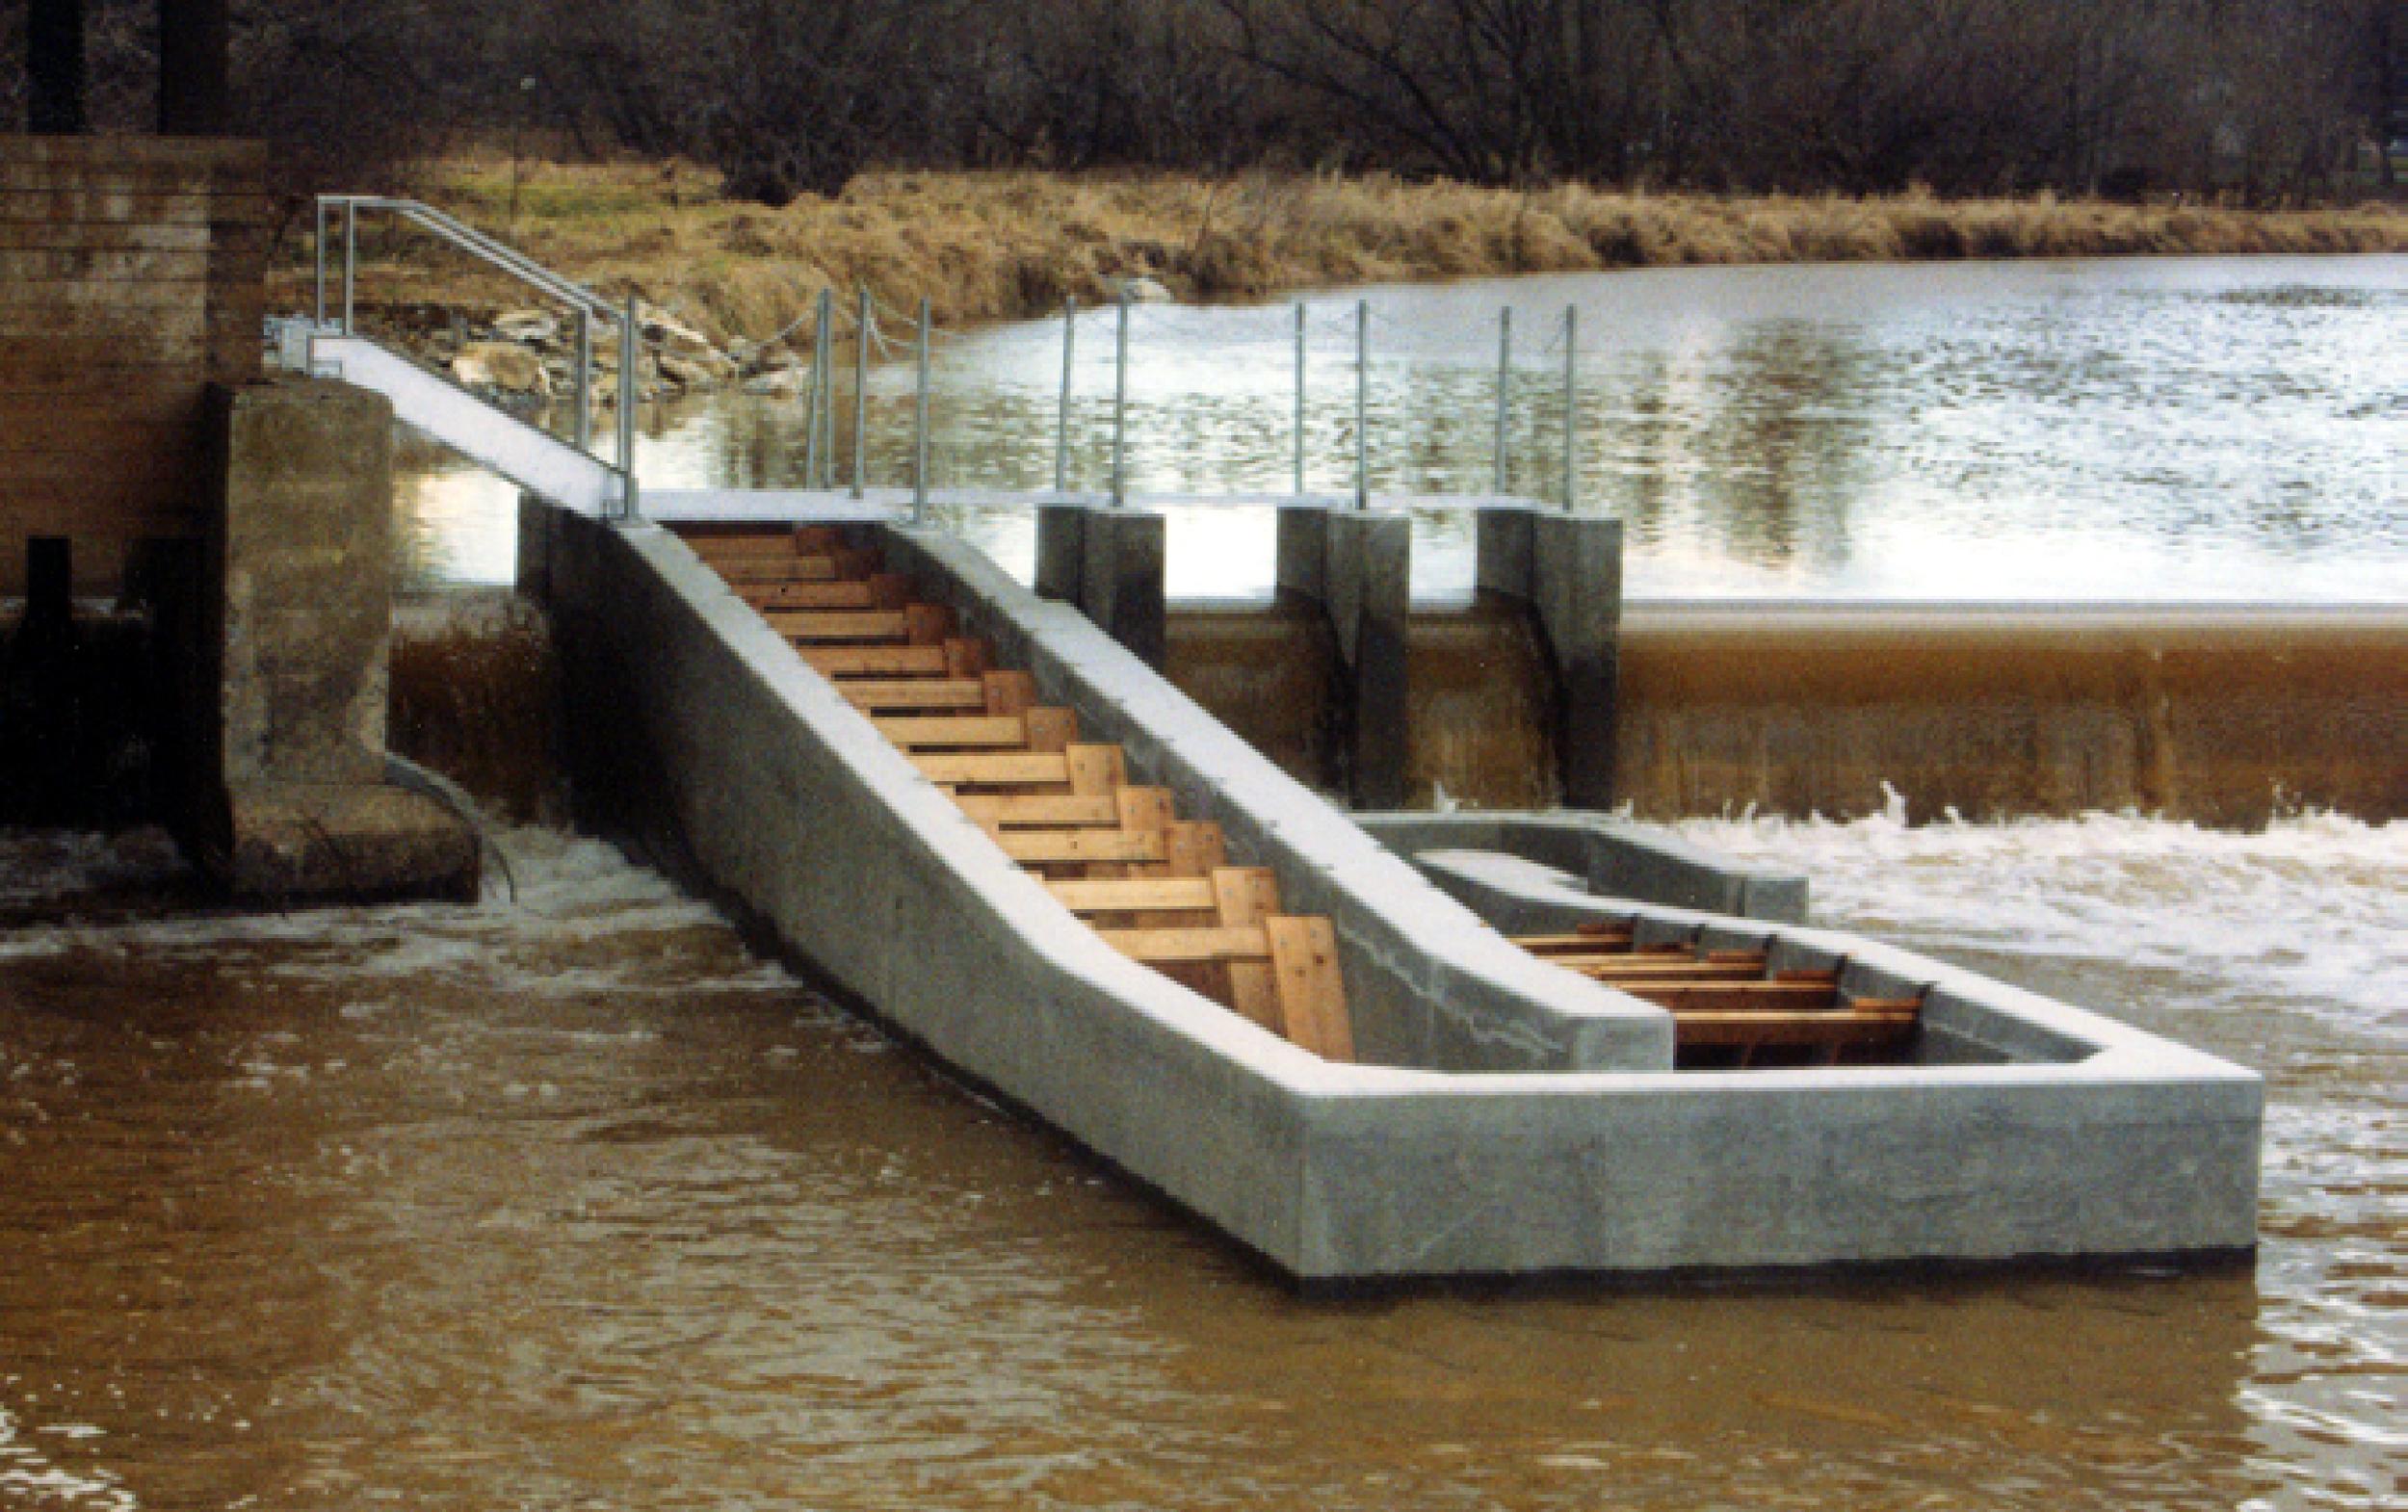 FIsh Pass at Conestoga water treatment plant dam